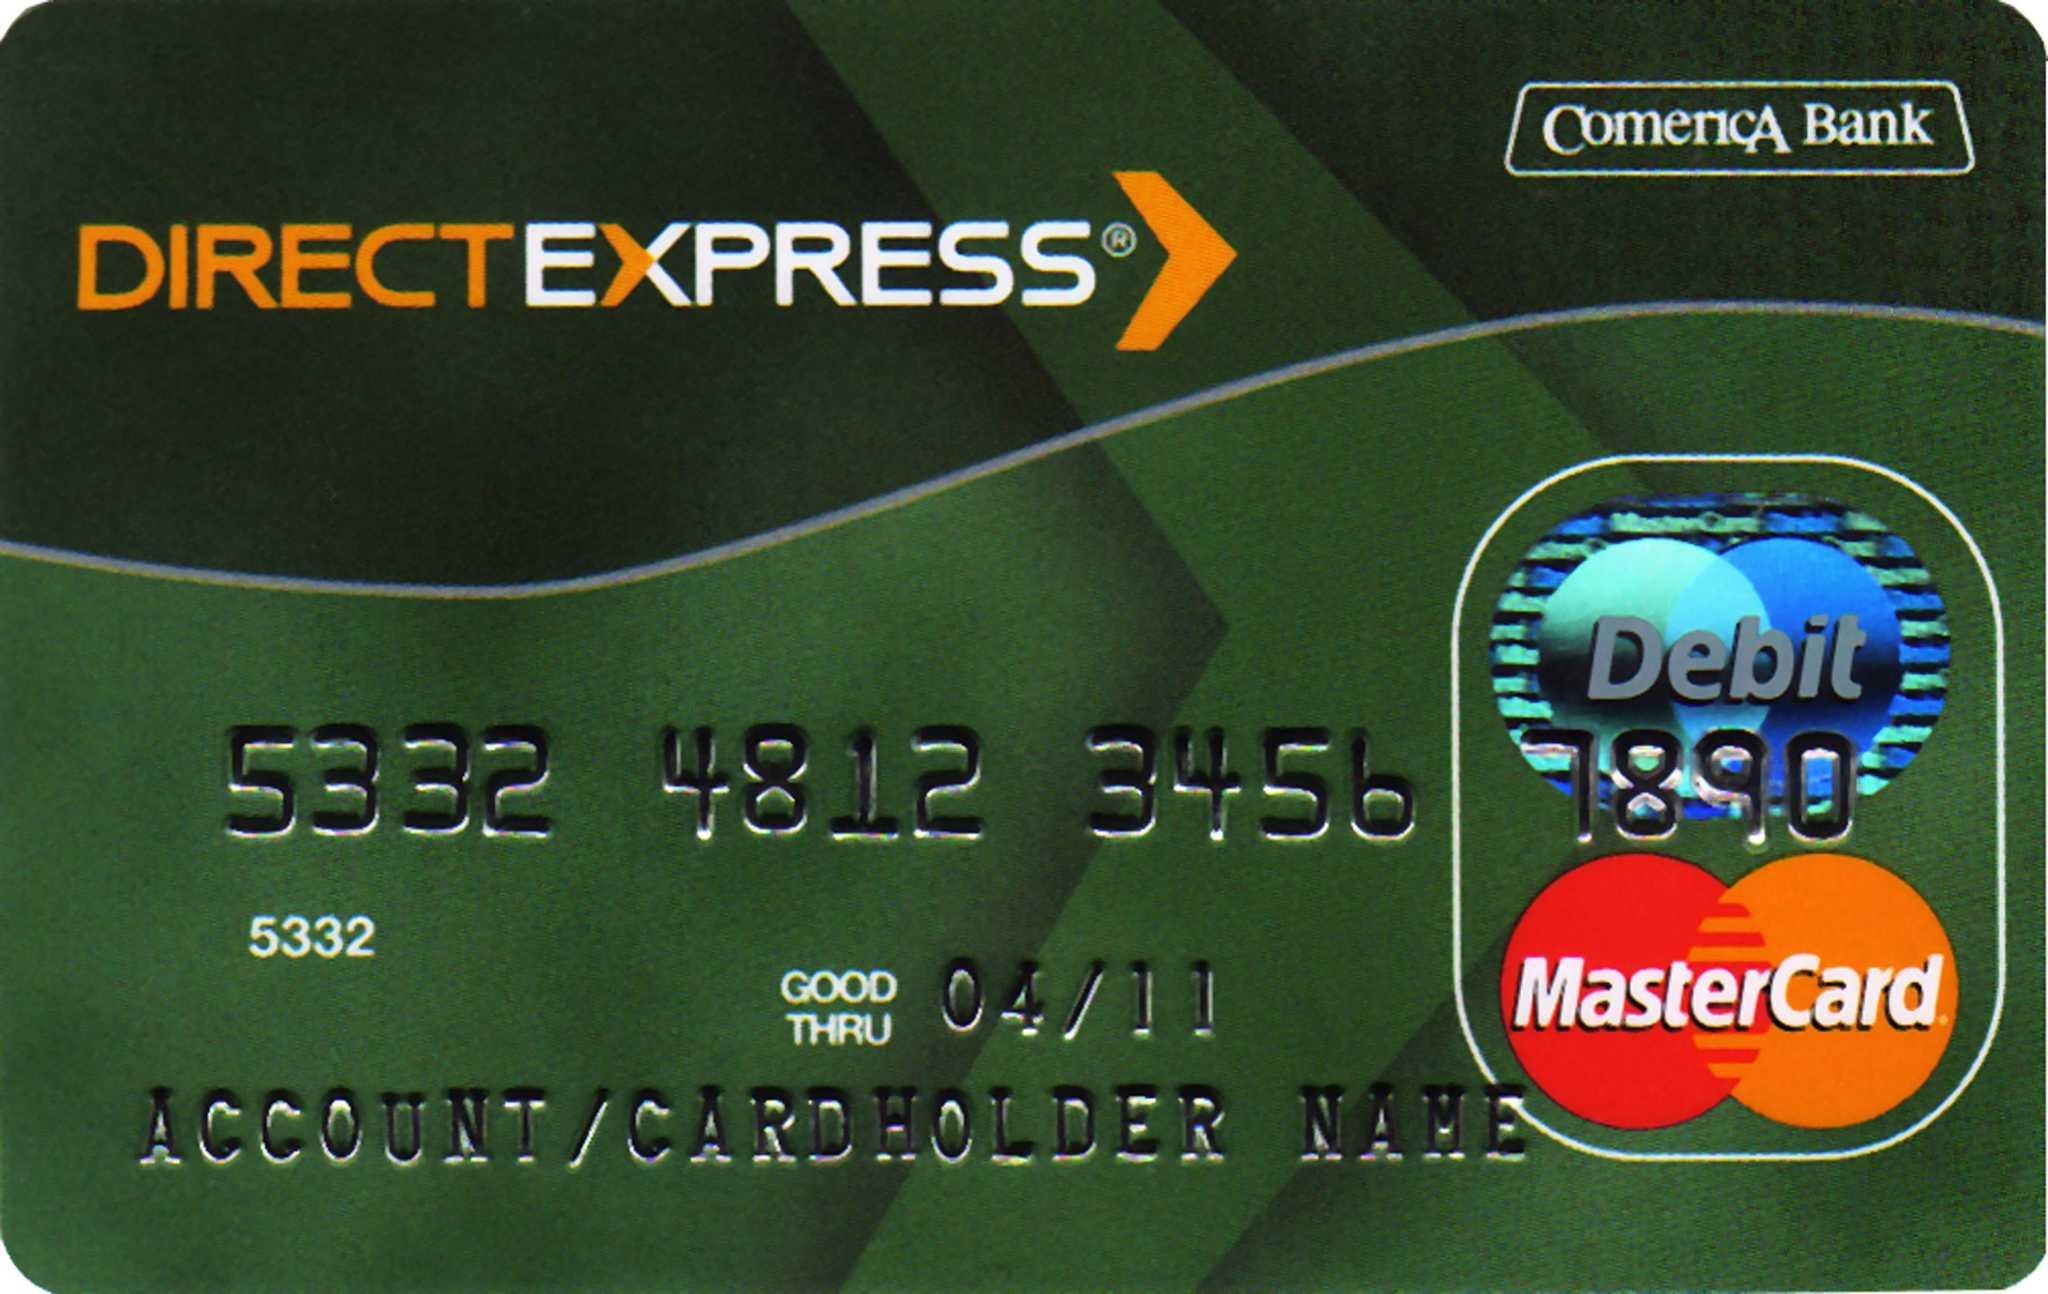 Retirees Veterans Sue Over Direct Express Debit Card Fraud Expressnews Com